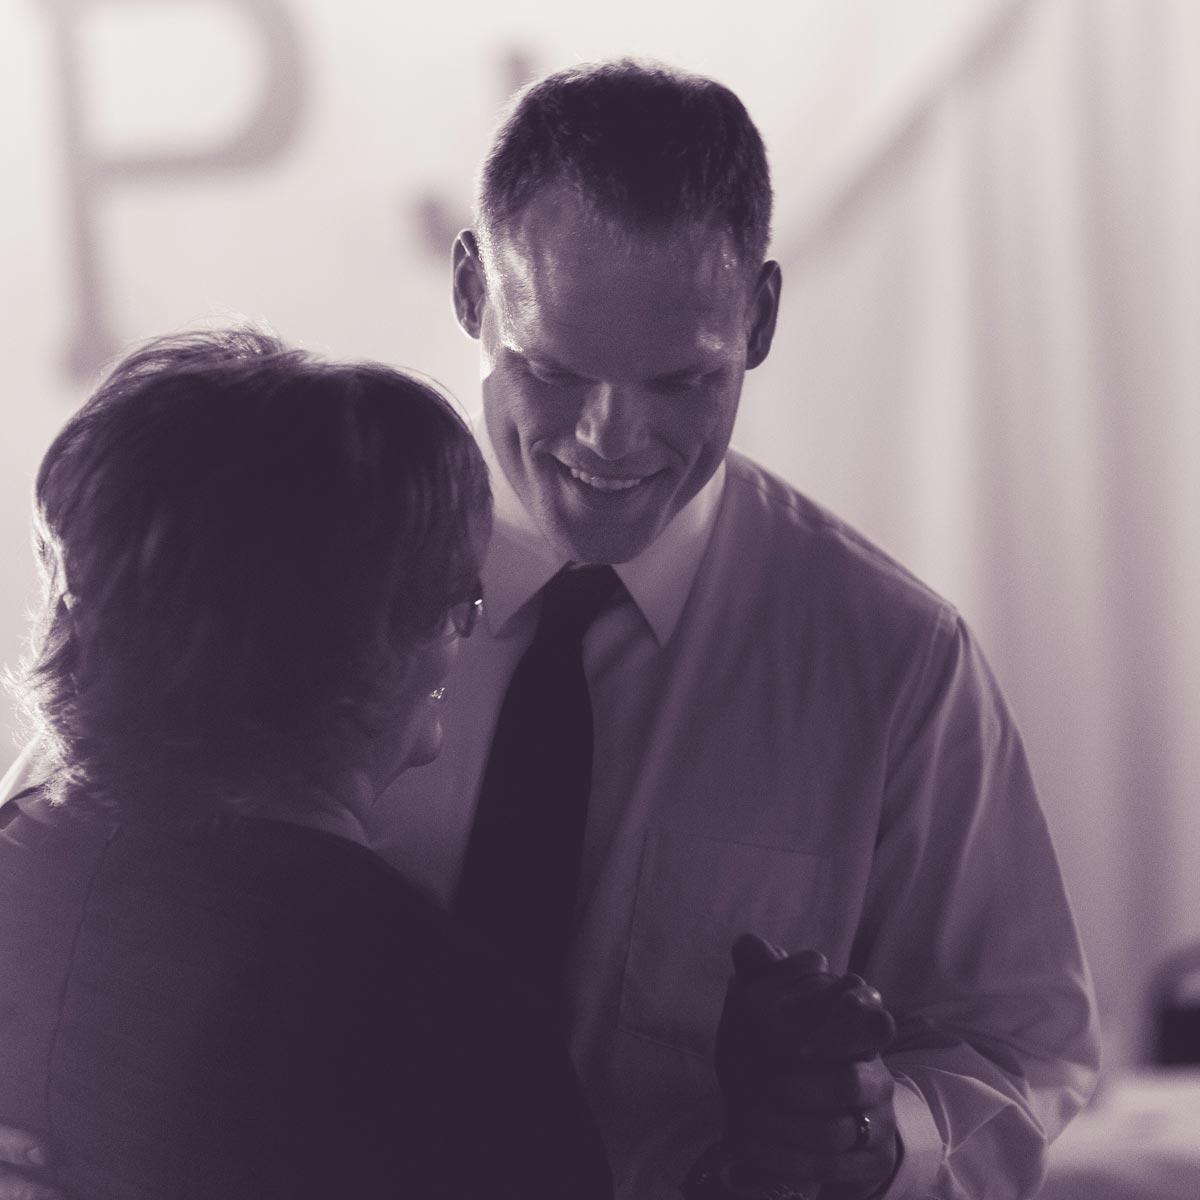 evansville-wedding-photographer-pabst-photo-kokies-echo-valley-(93)